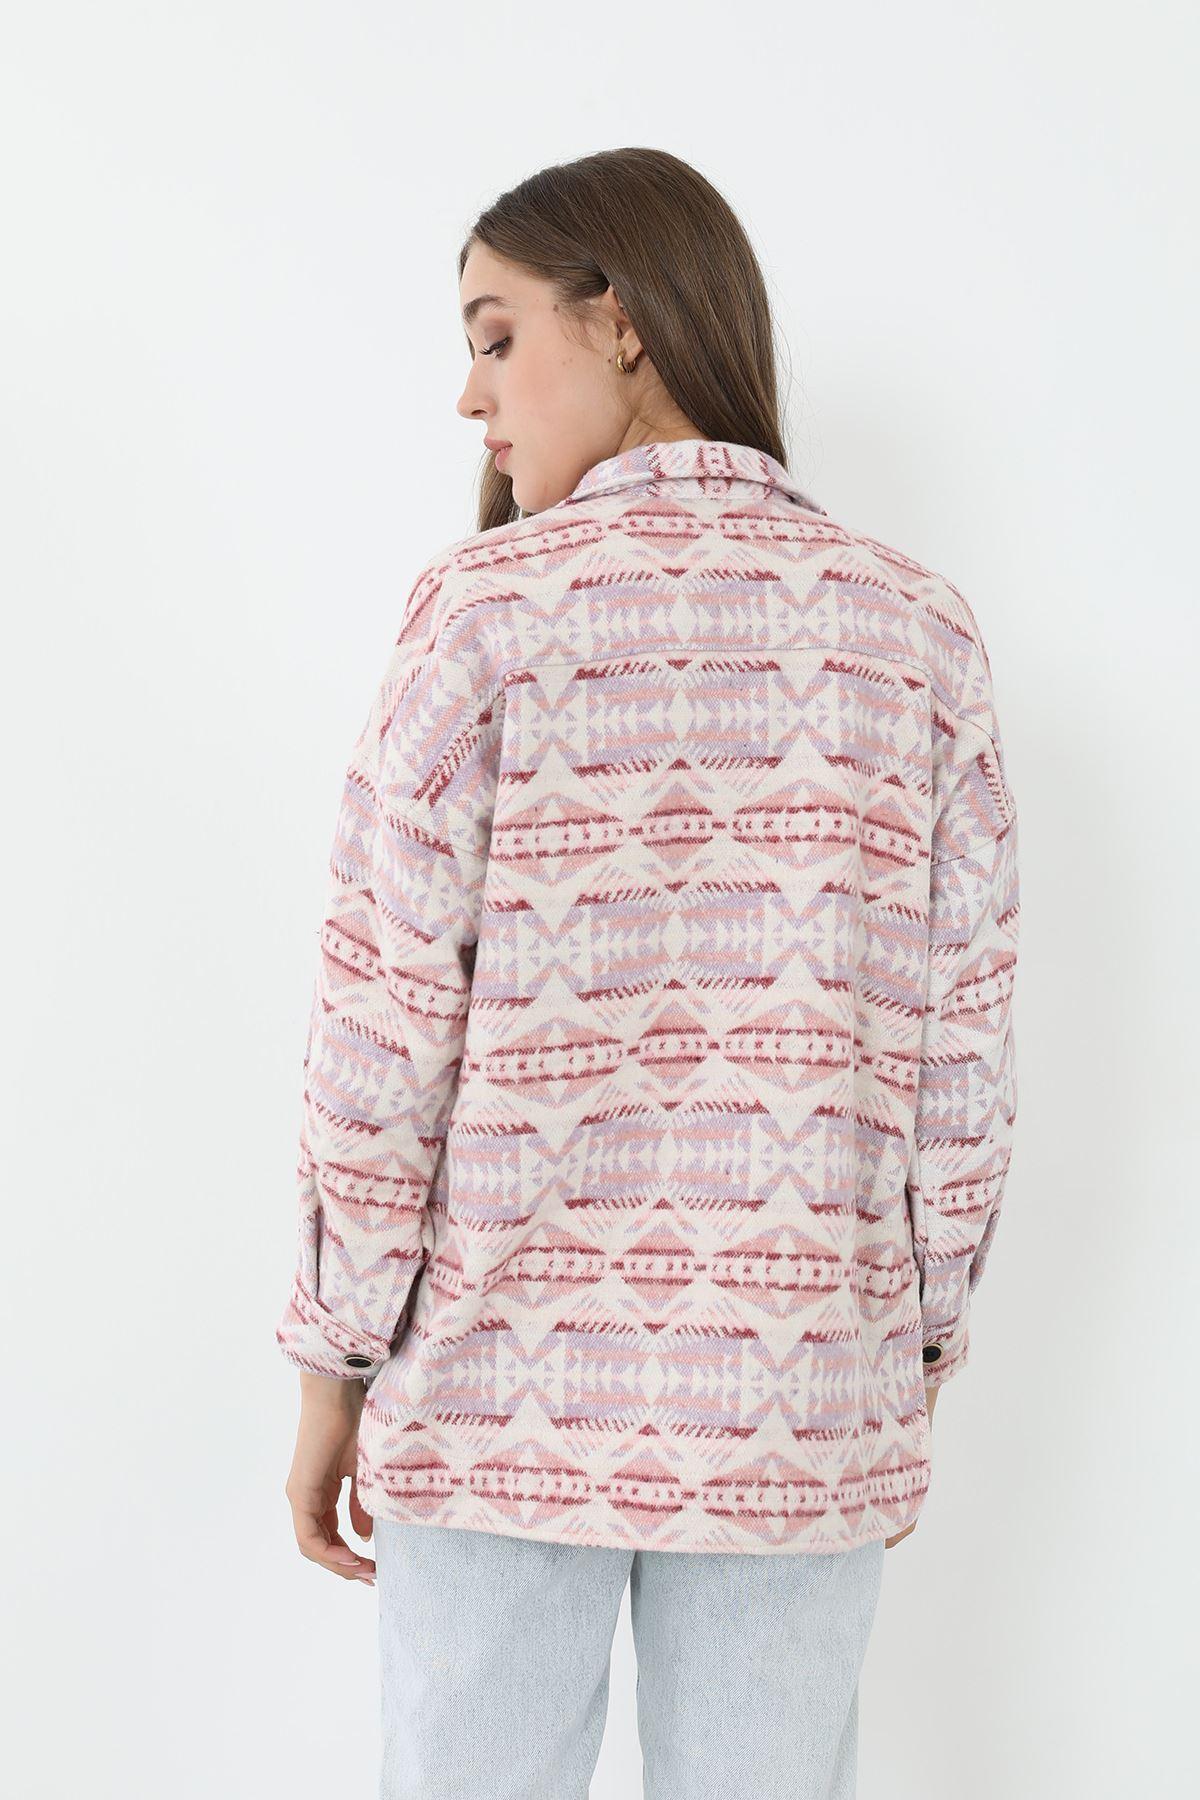 Etnik Desen Kaşe Gömlek-Pudra